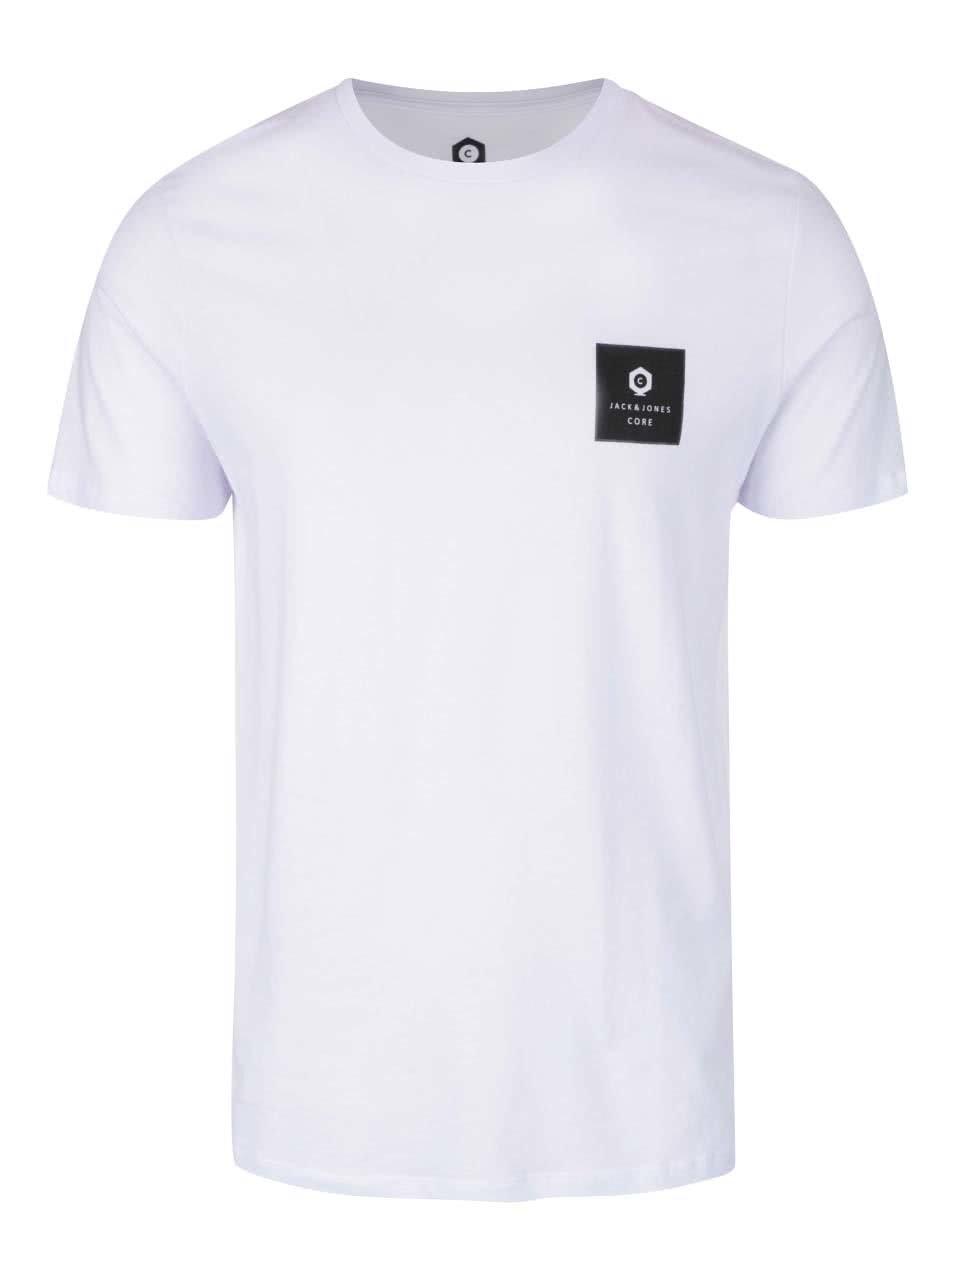 Bílé triko s potiskem Jack & Jones Radical